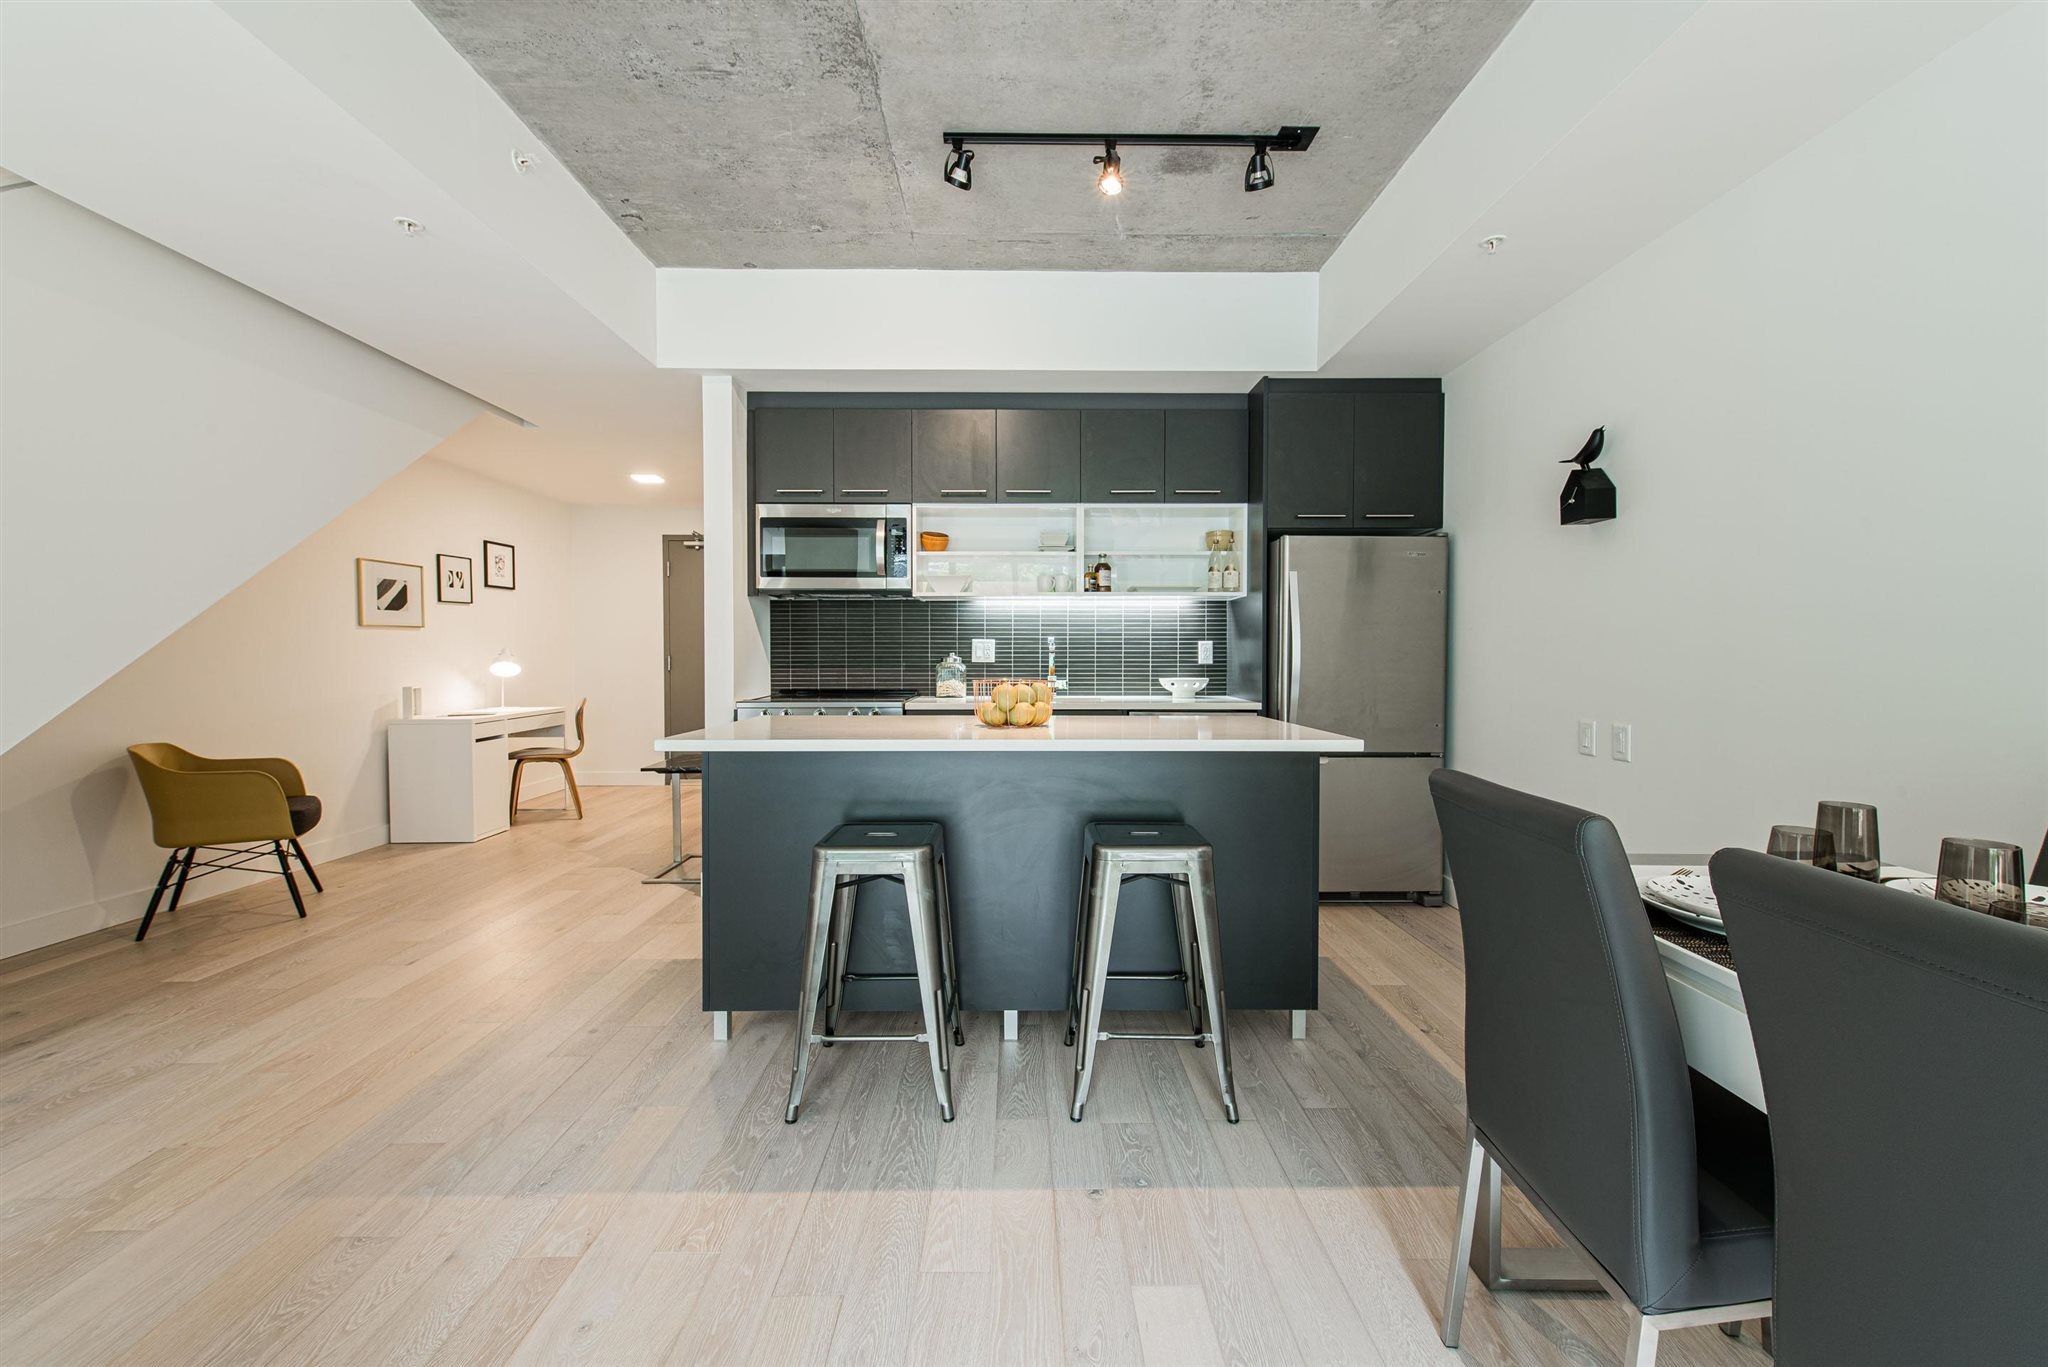 Photo 10: Photos: 105 1048 Wellington Street in Halifax: 2-Halifax South Residential for sale (Halifax-Dartmouth)  : MLS®# 202100816